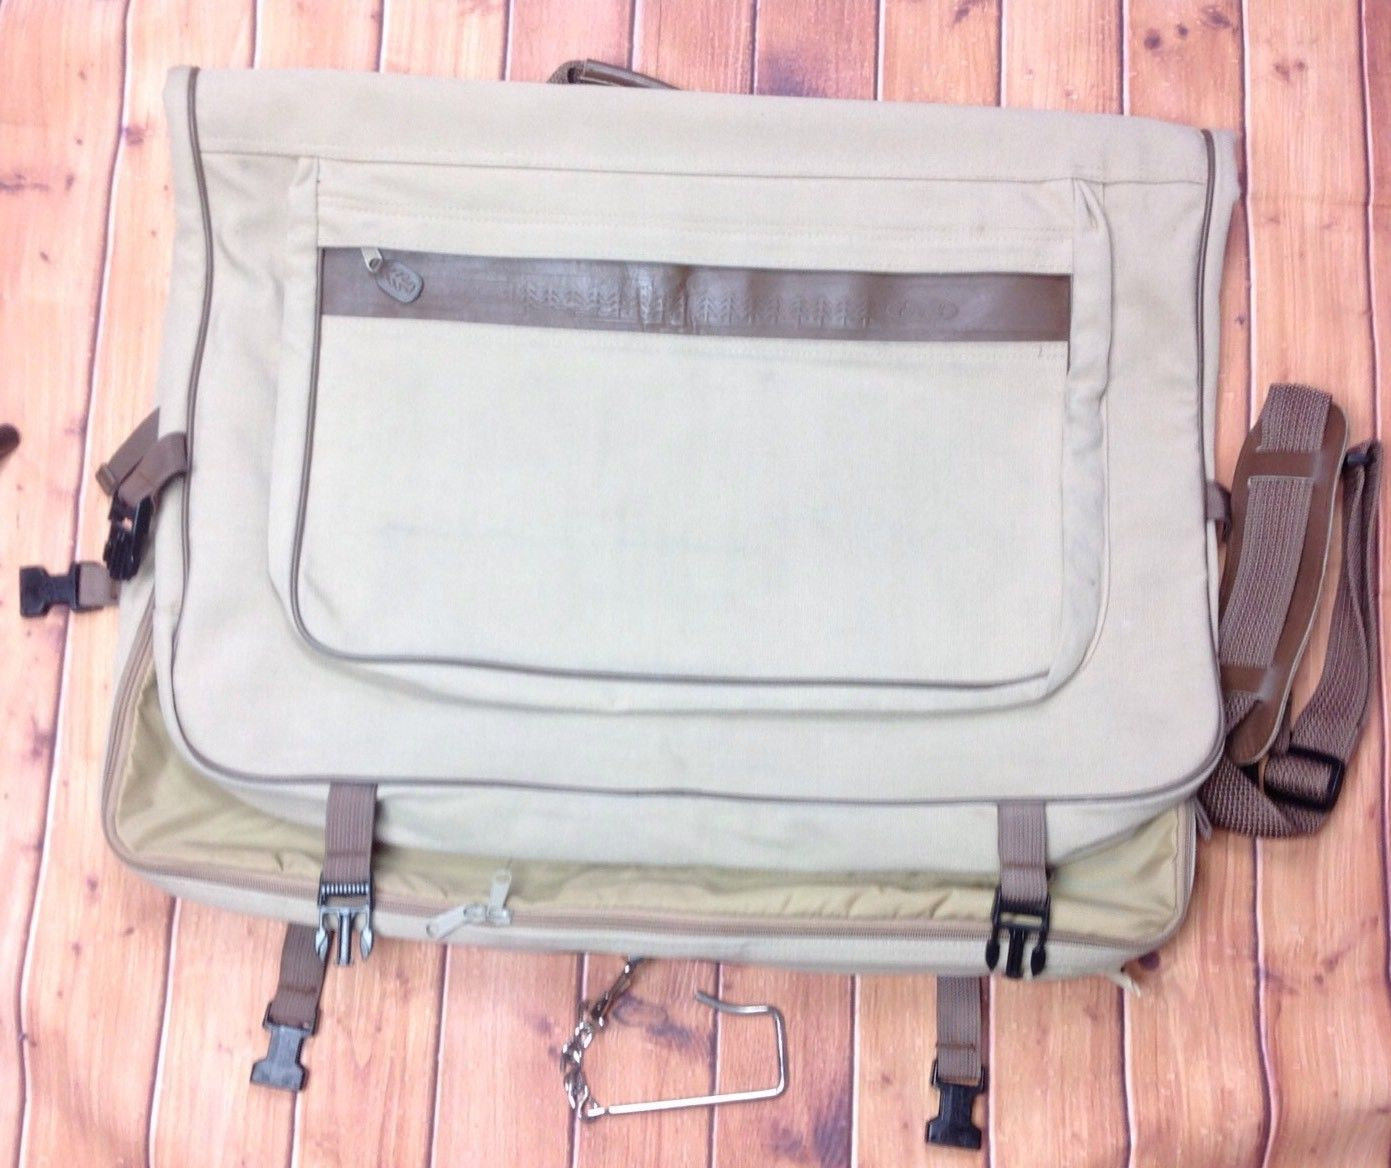 87b6146f09 S l1600. S l1600. Previous. Eddie Bauer Ford Tan Canvas Folding Hanging Suit  Garment Bag Dress Luggage Beige